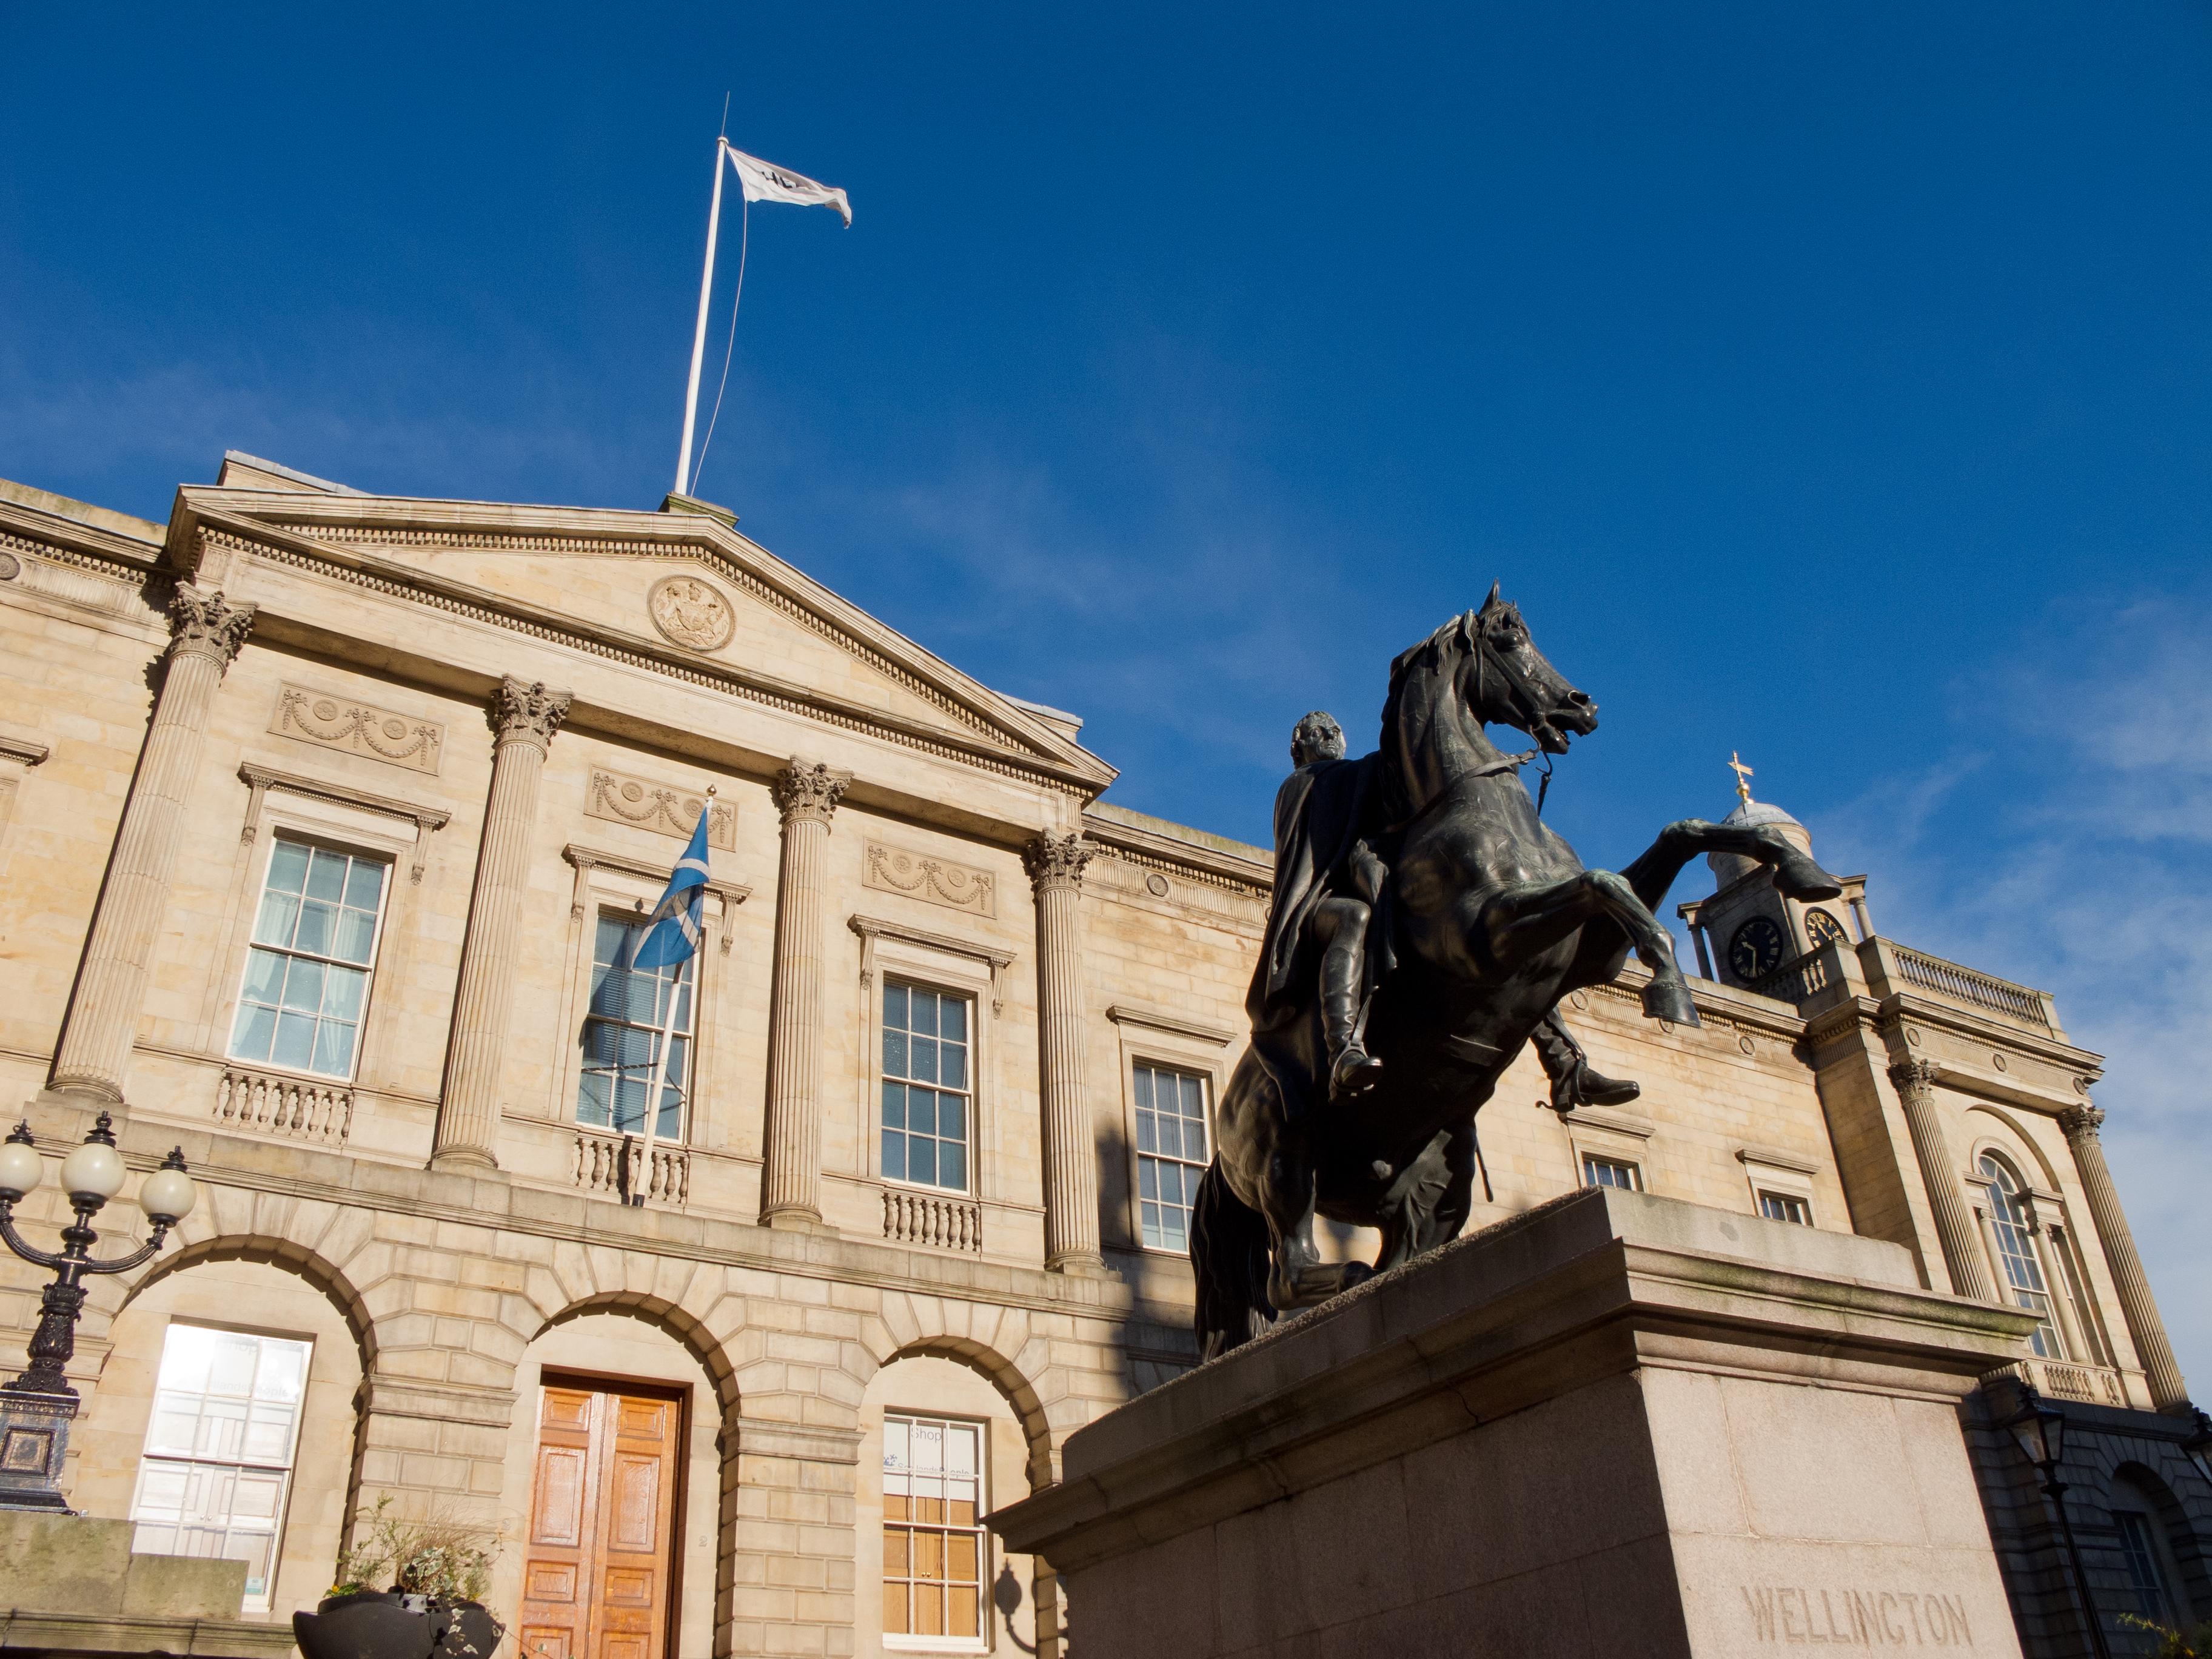 Duke of Wellington and General Register House, Edinburgh, Scotland, UK.